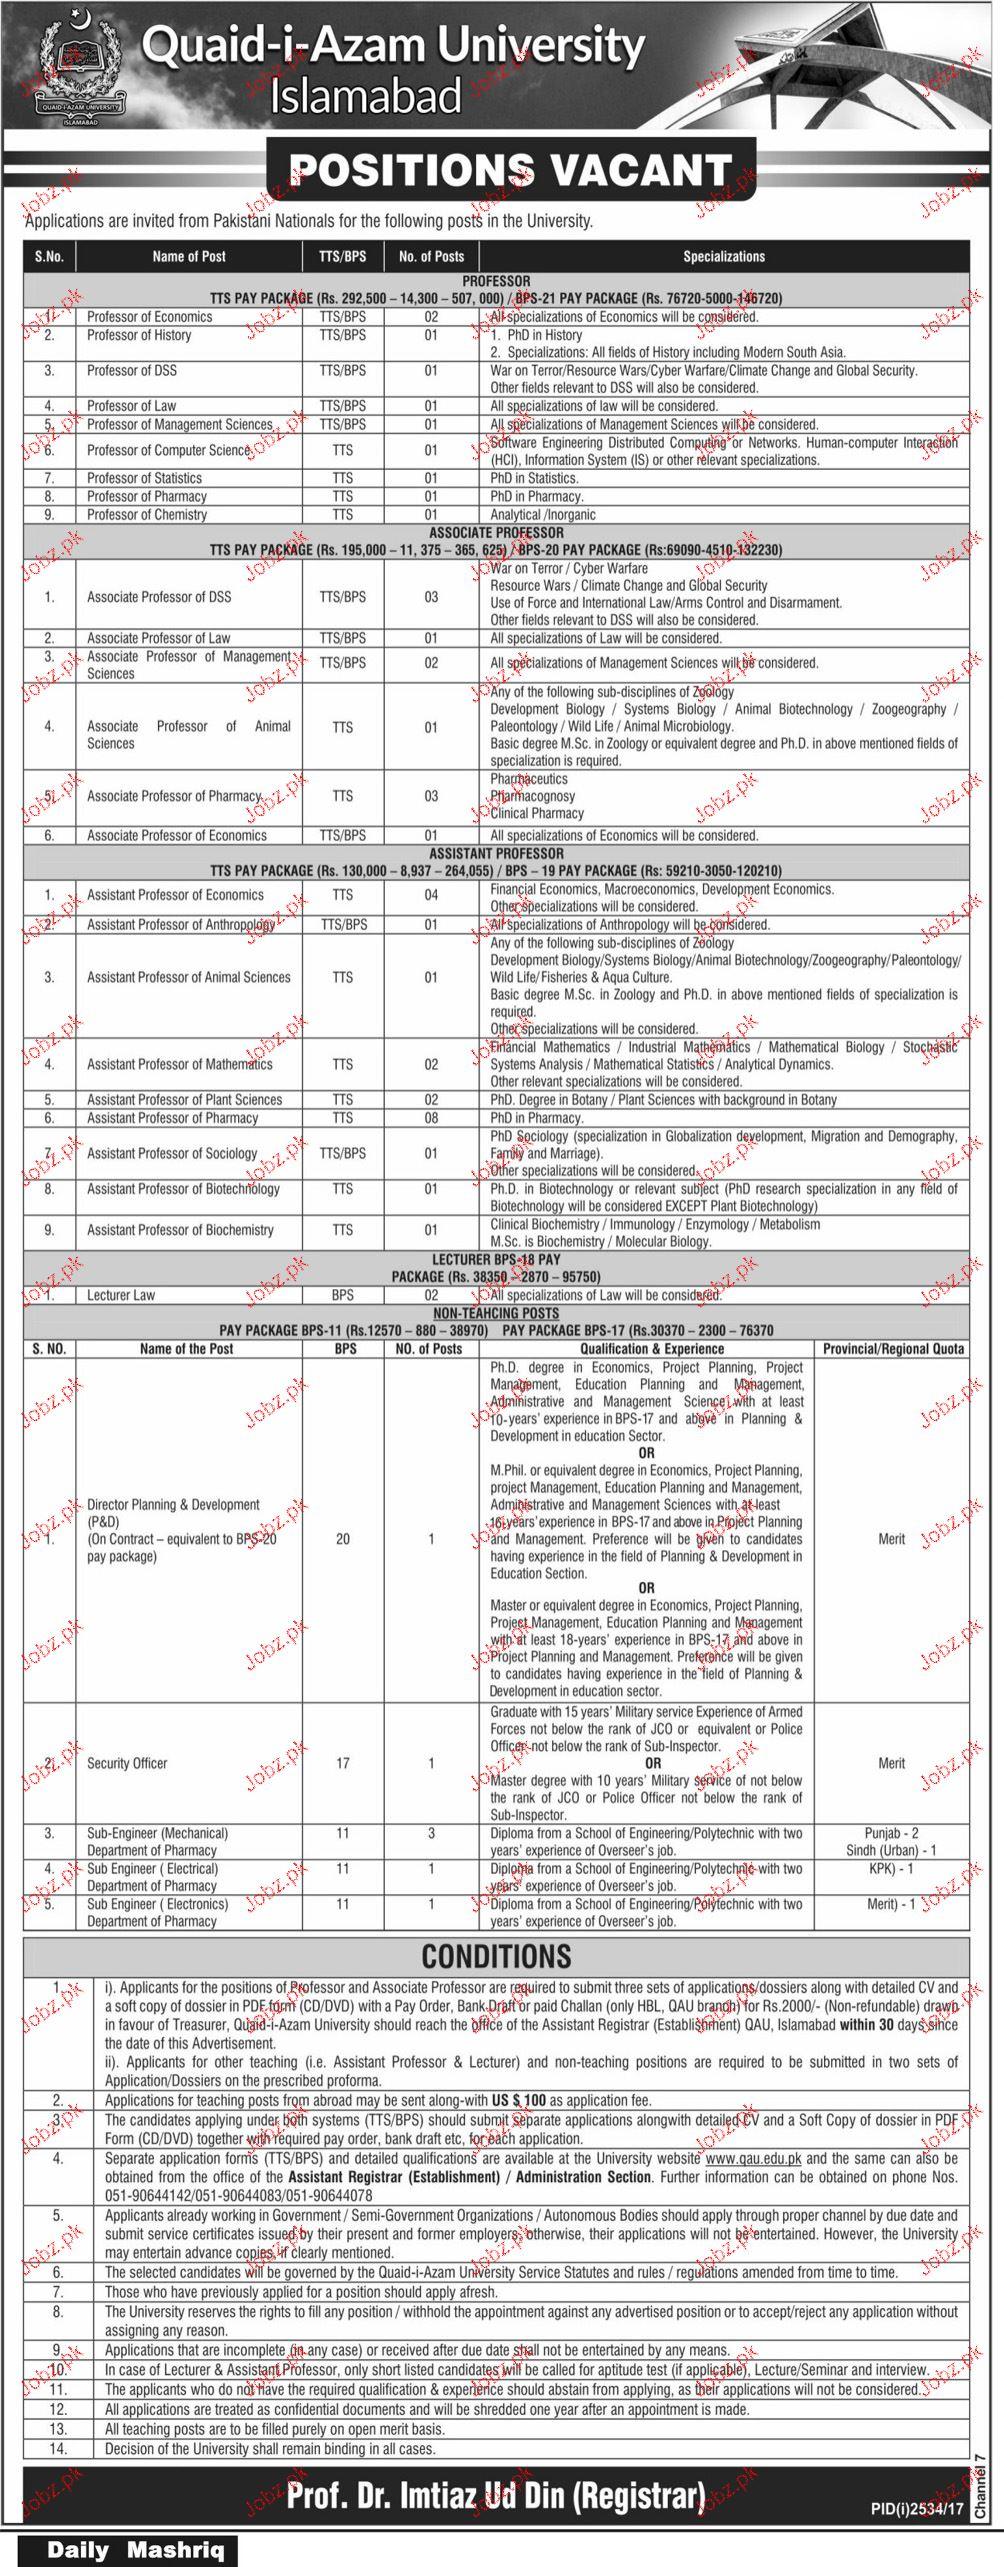 Quaid-E-Azam University Job